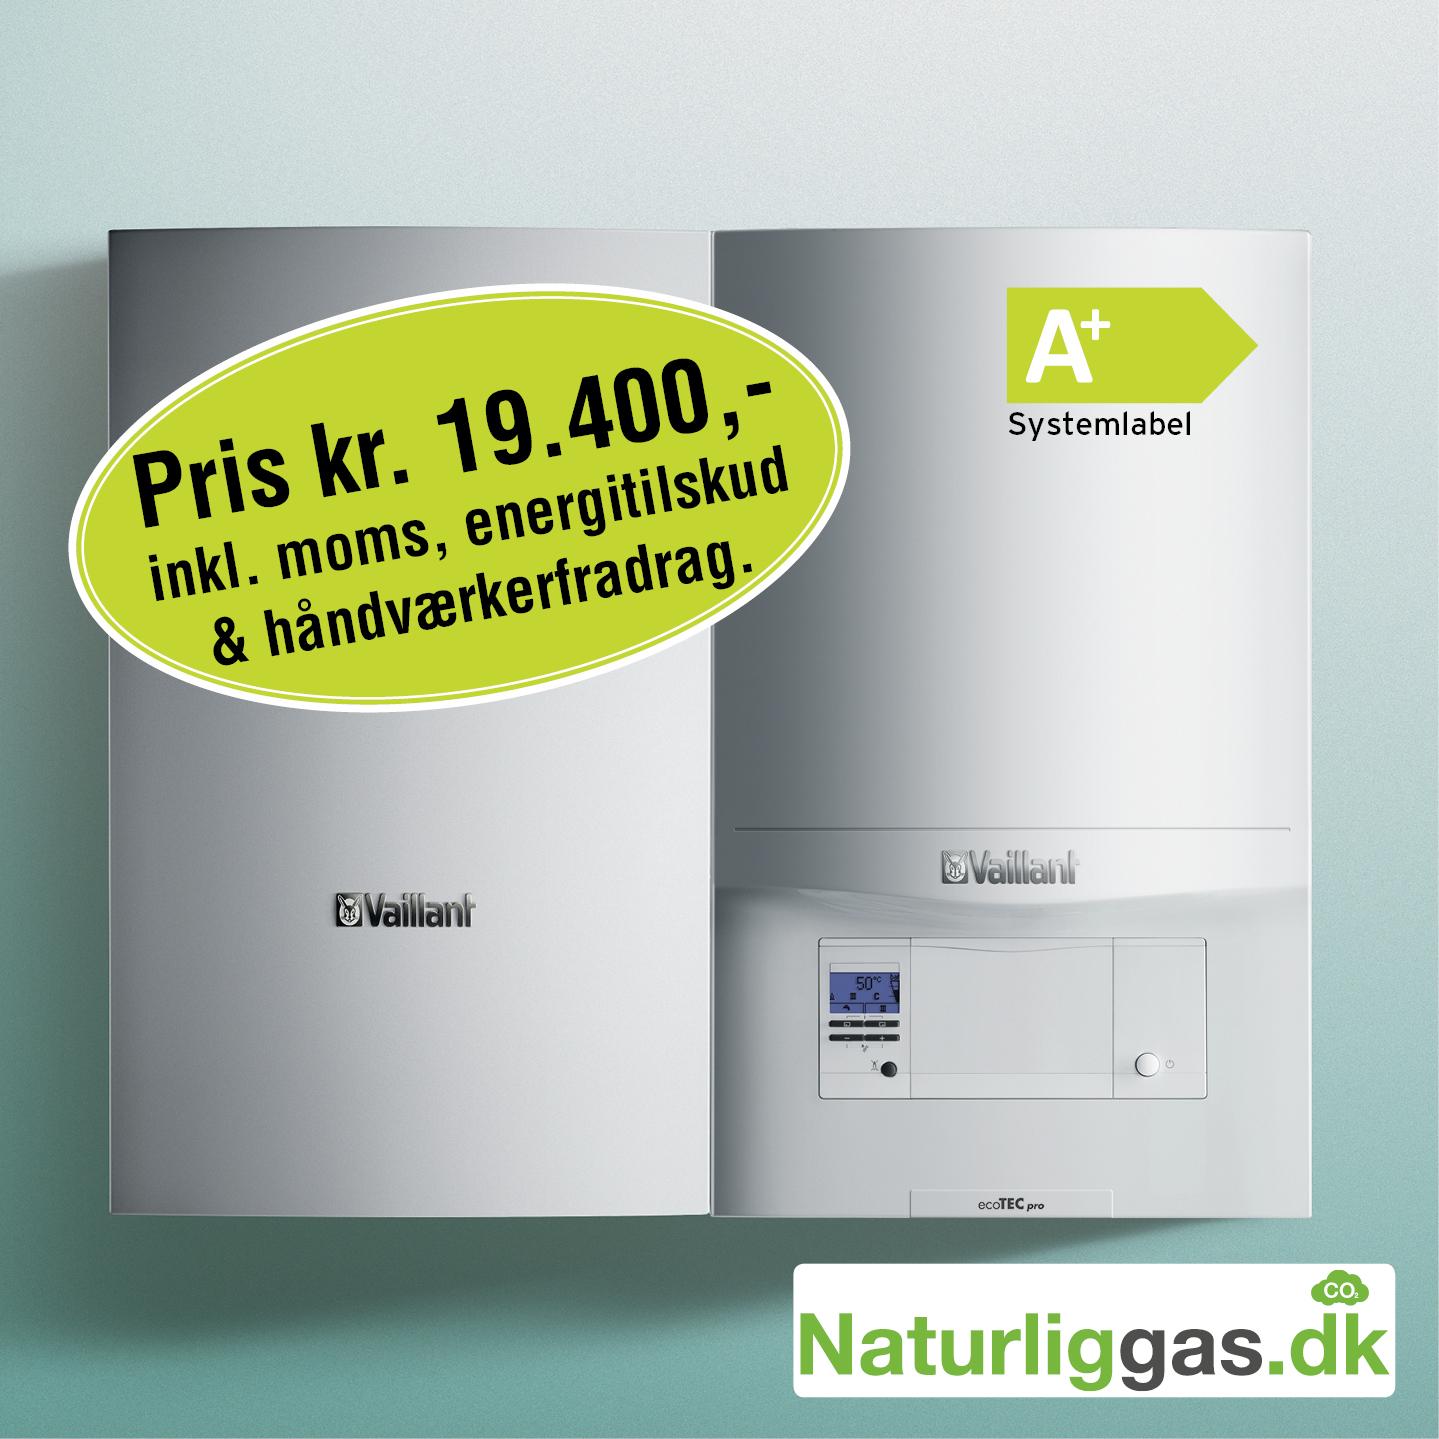 Naturliggas 1439x1439 med logo og pris - pro - Naturliggas